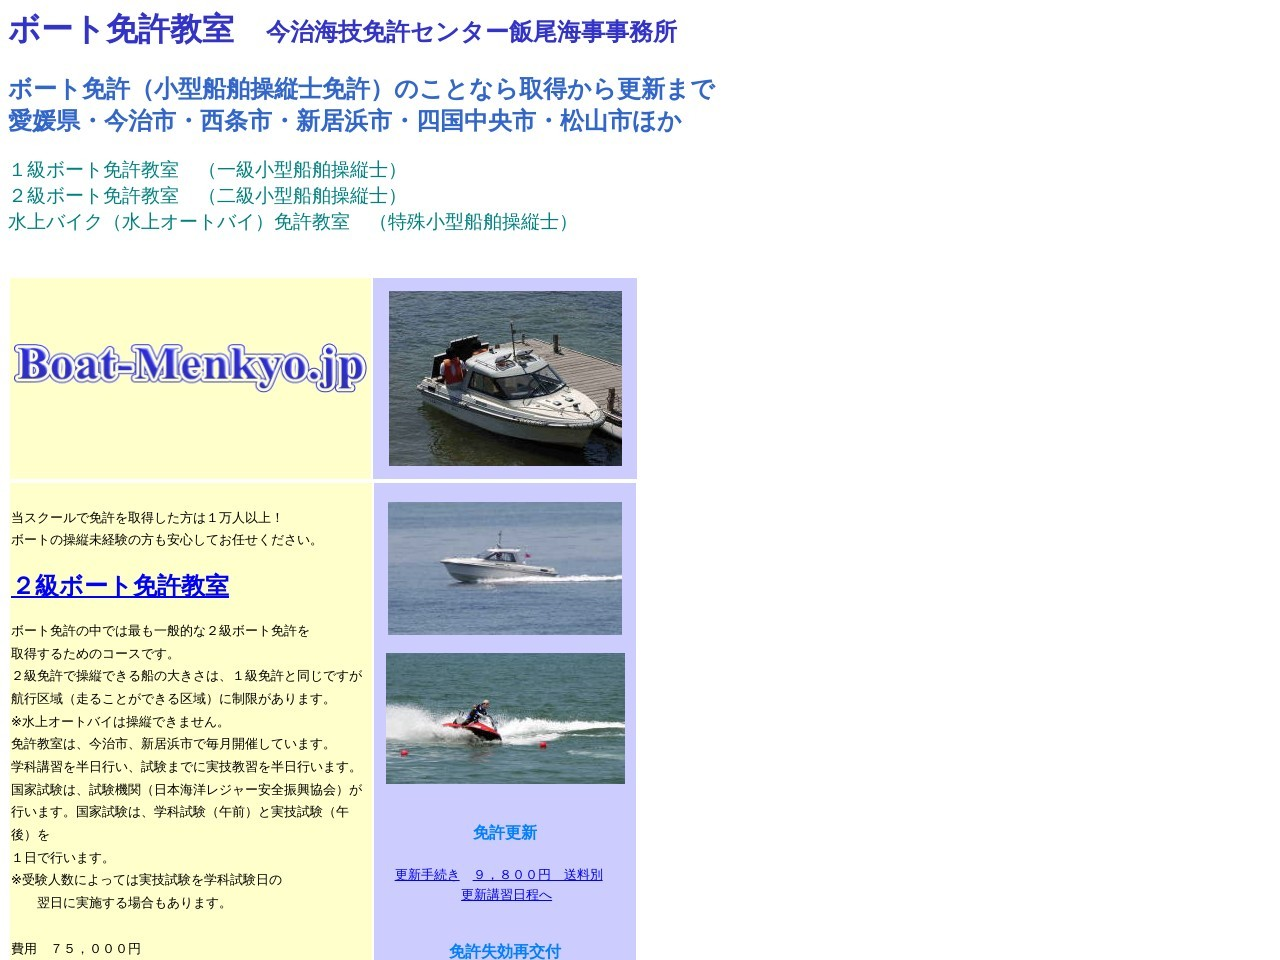 飯尾海事事務所/今治海技免許センター